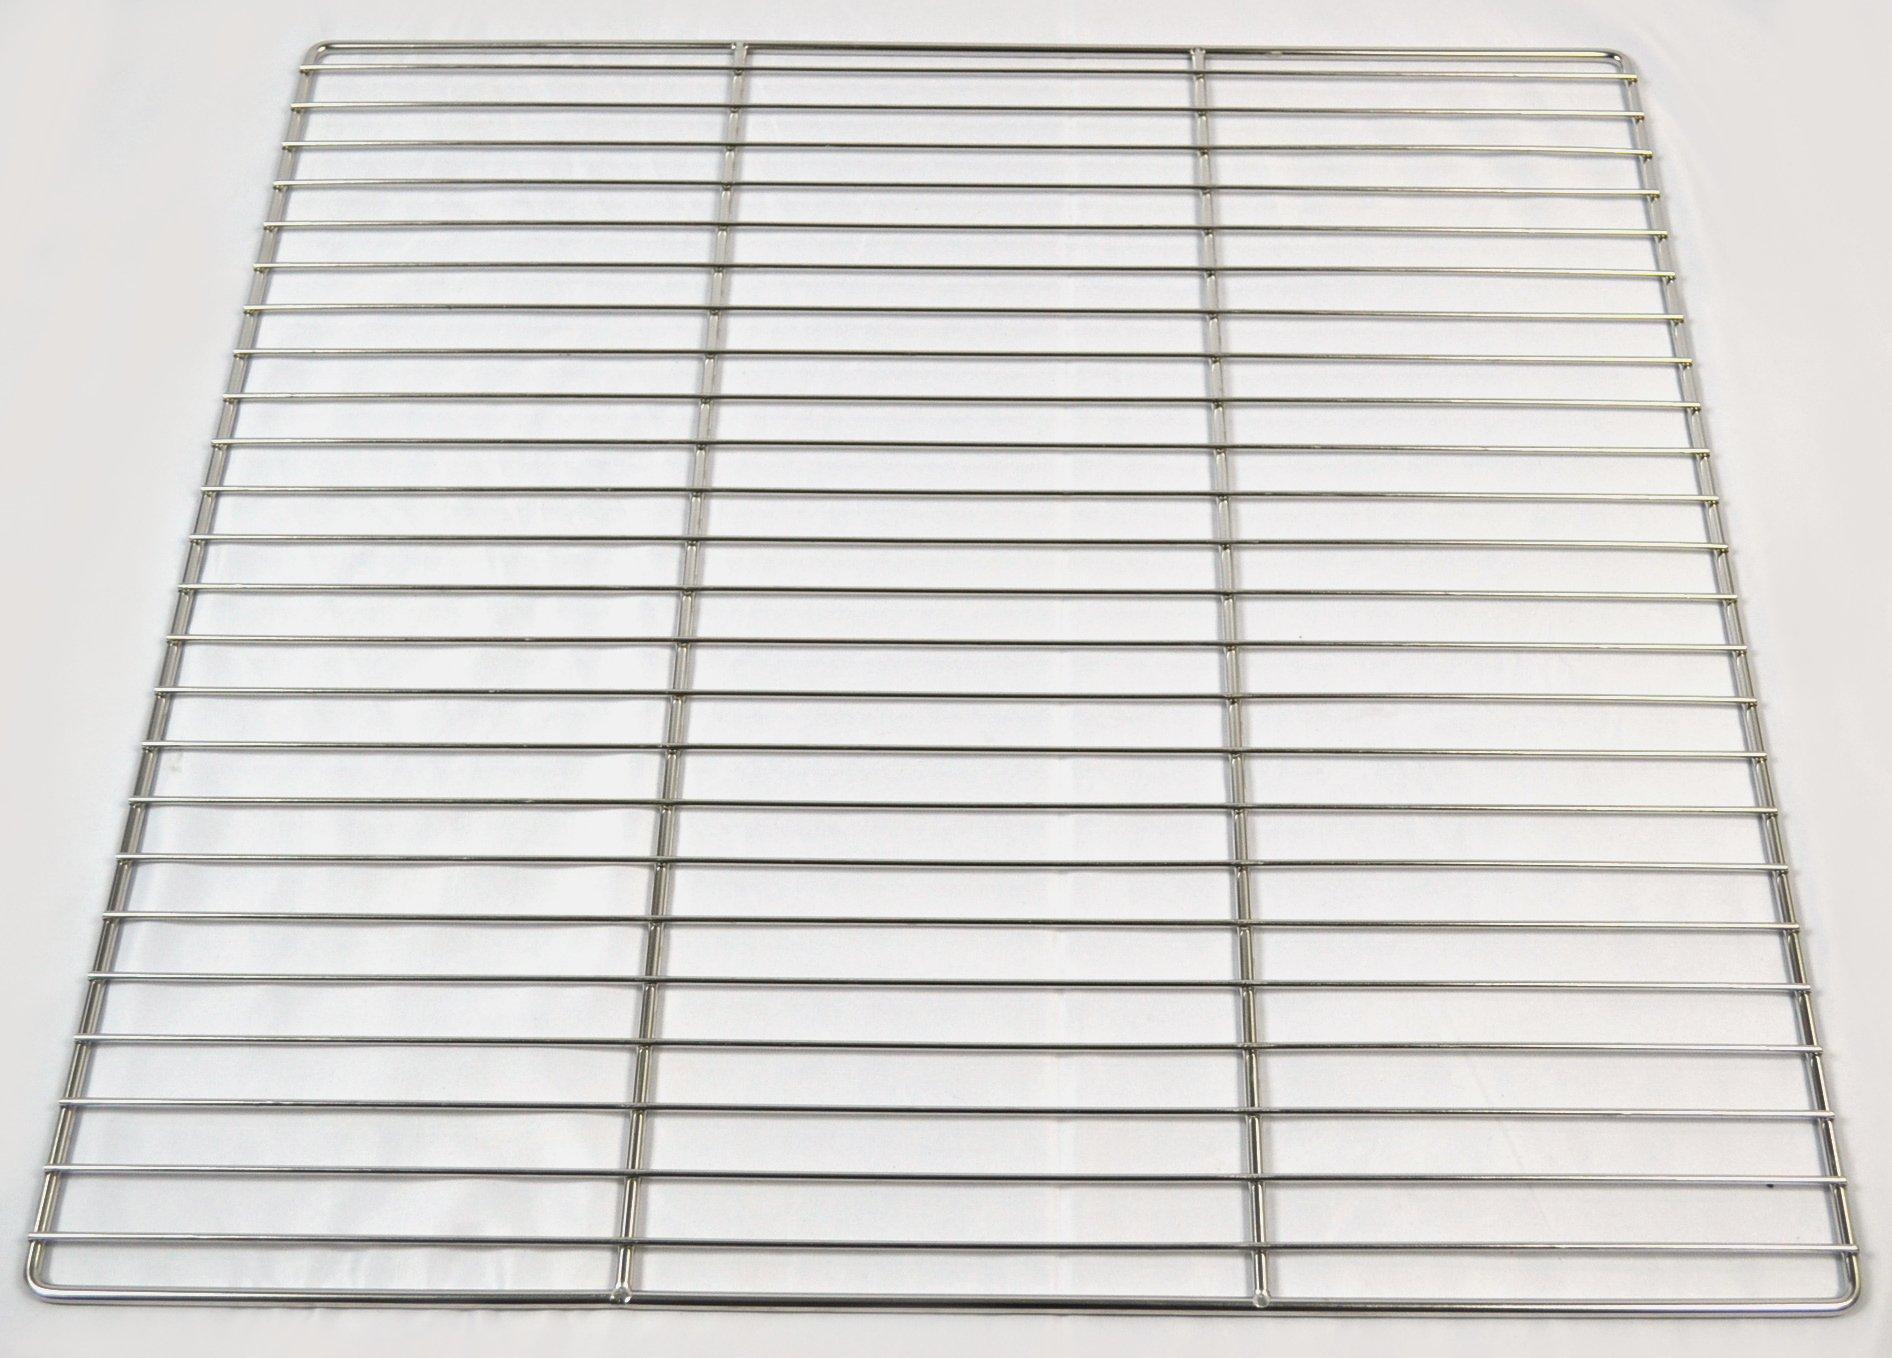 Belshaw HG24-0001 Glazing Screen, 24'' x 24'' (3)